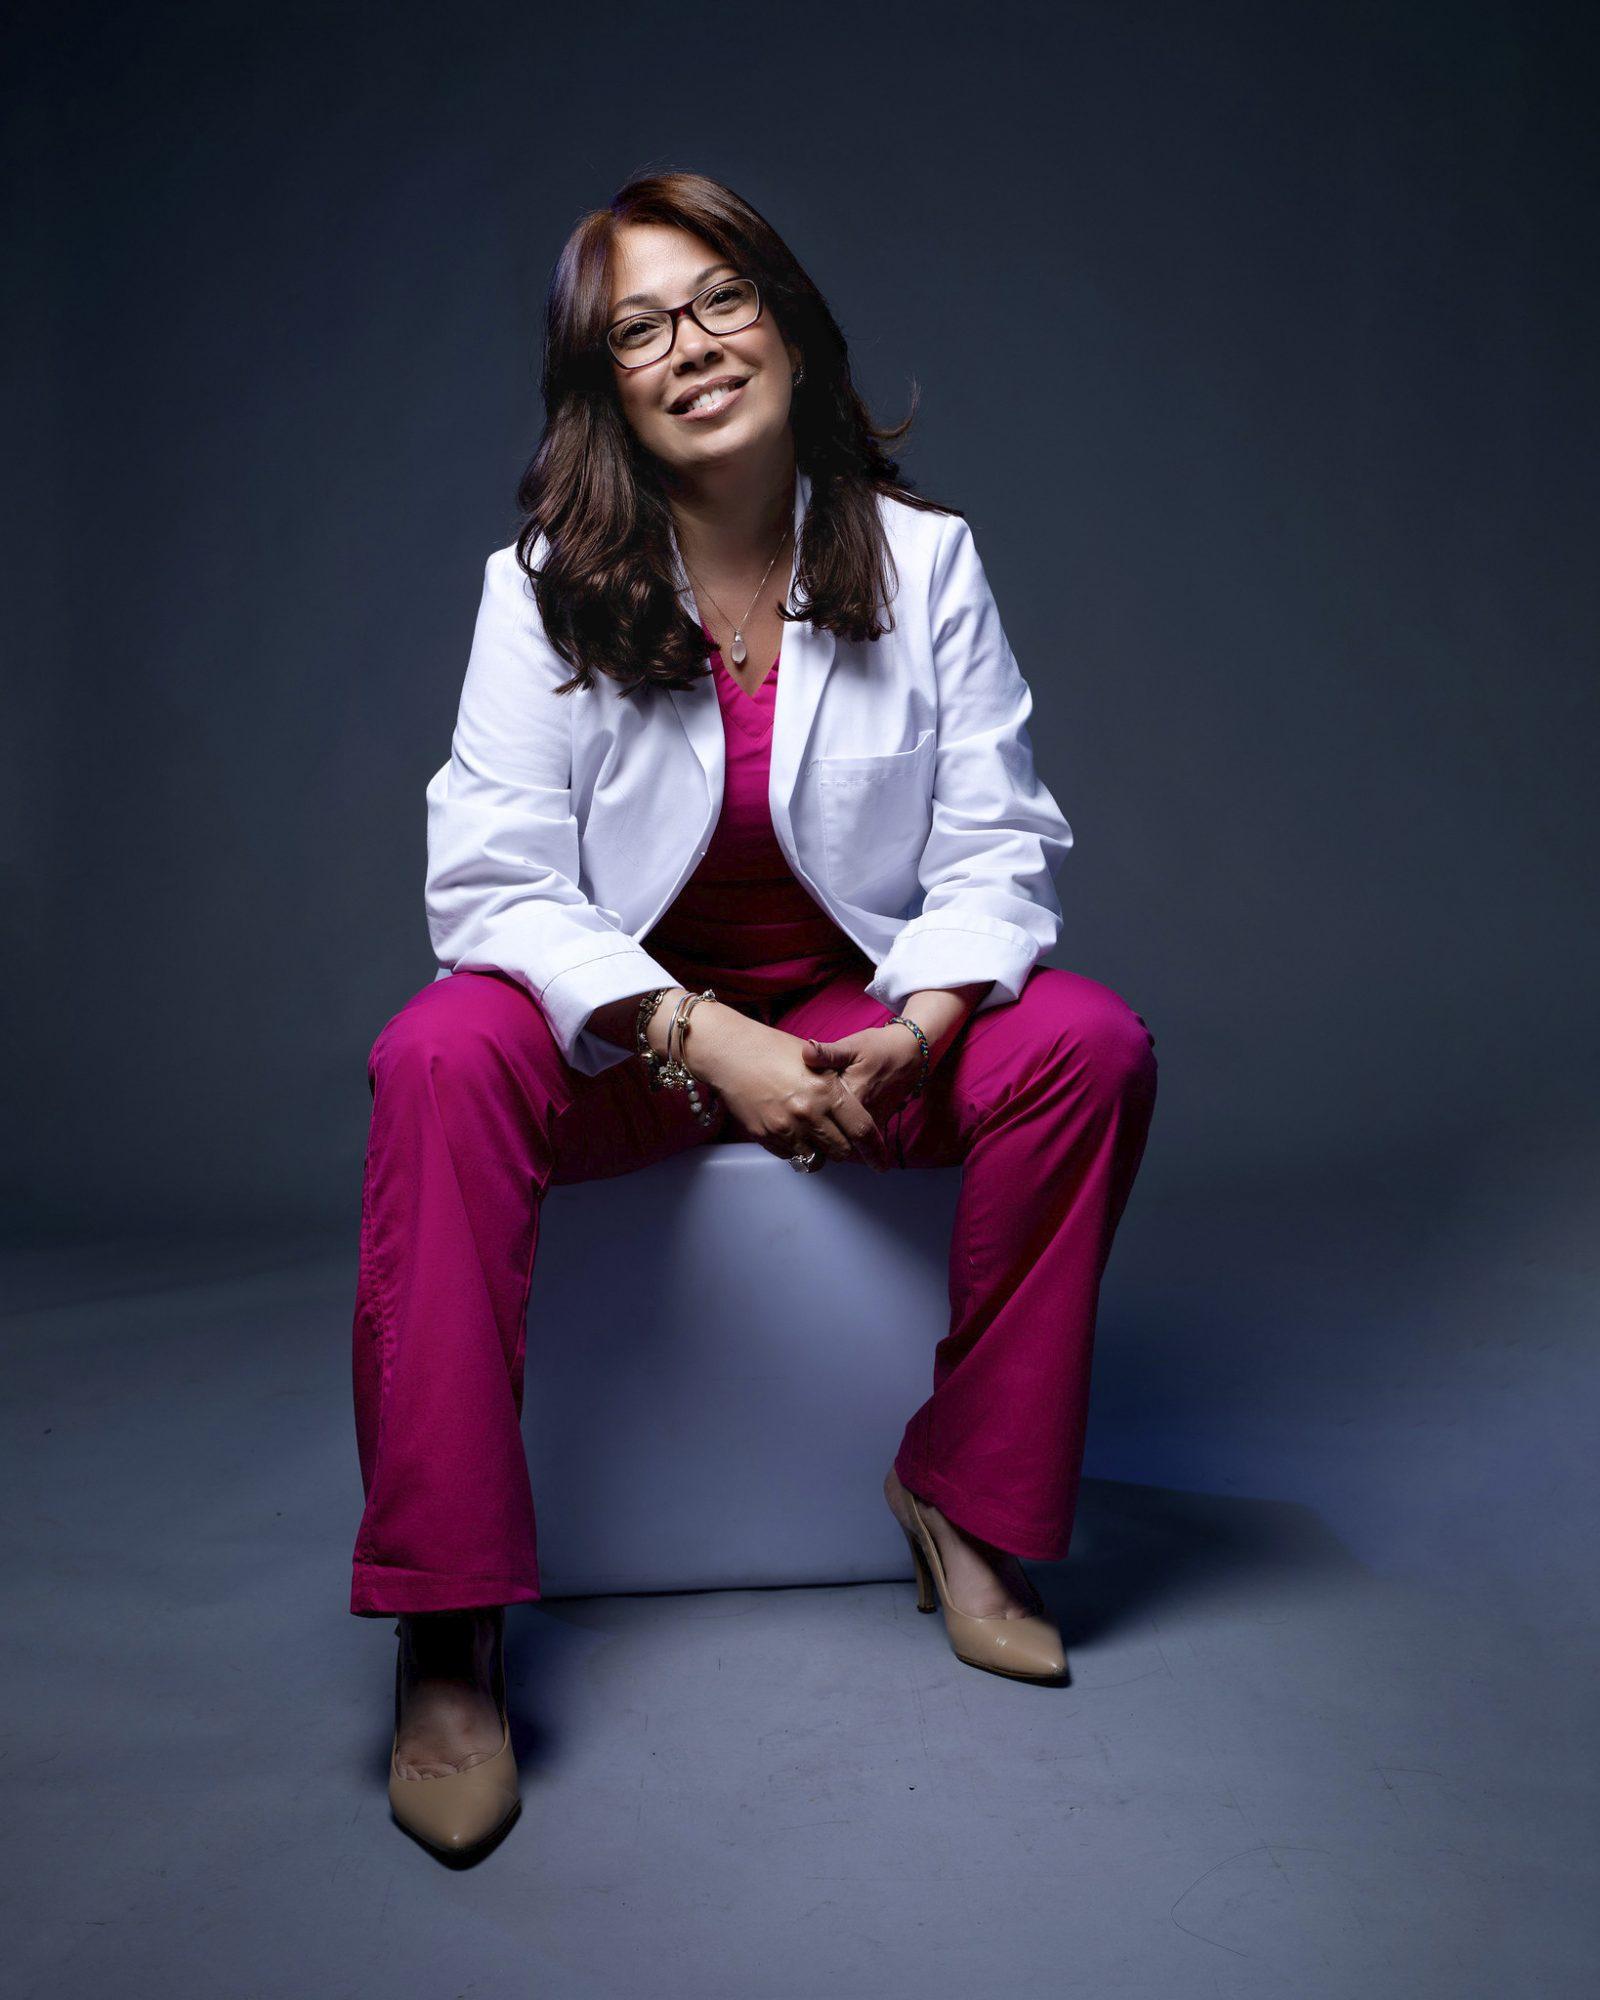 Dr Denise Núñez